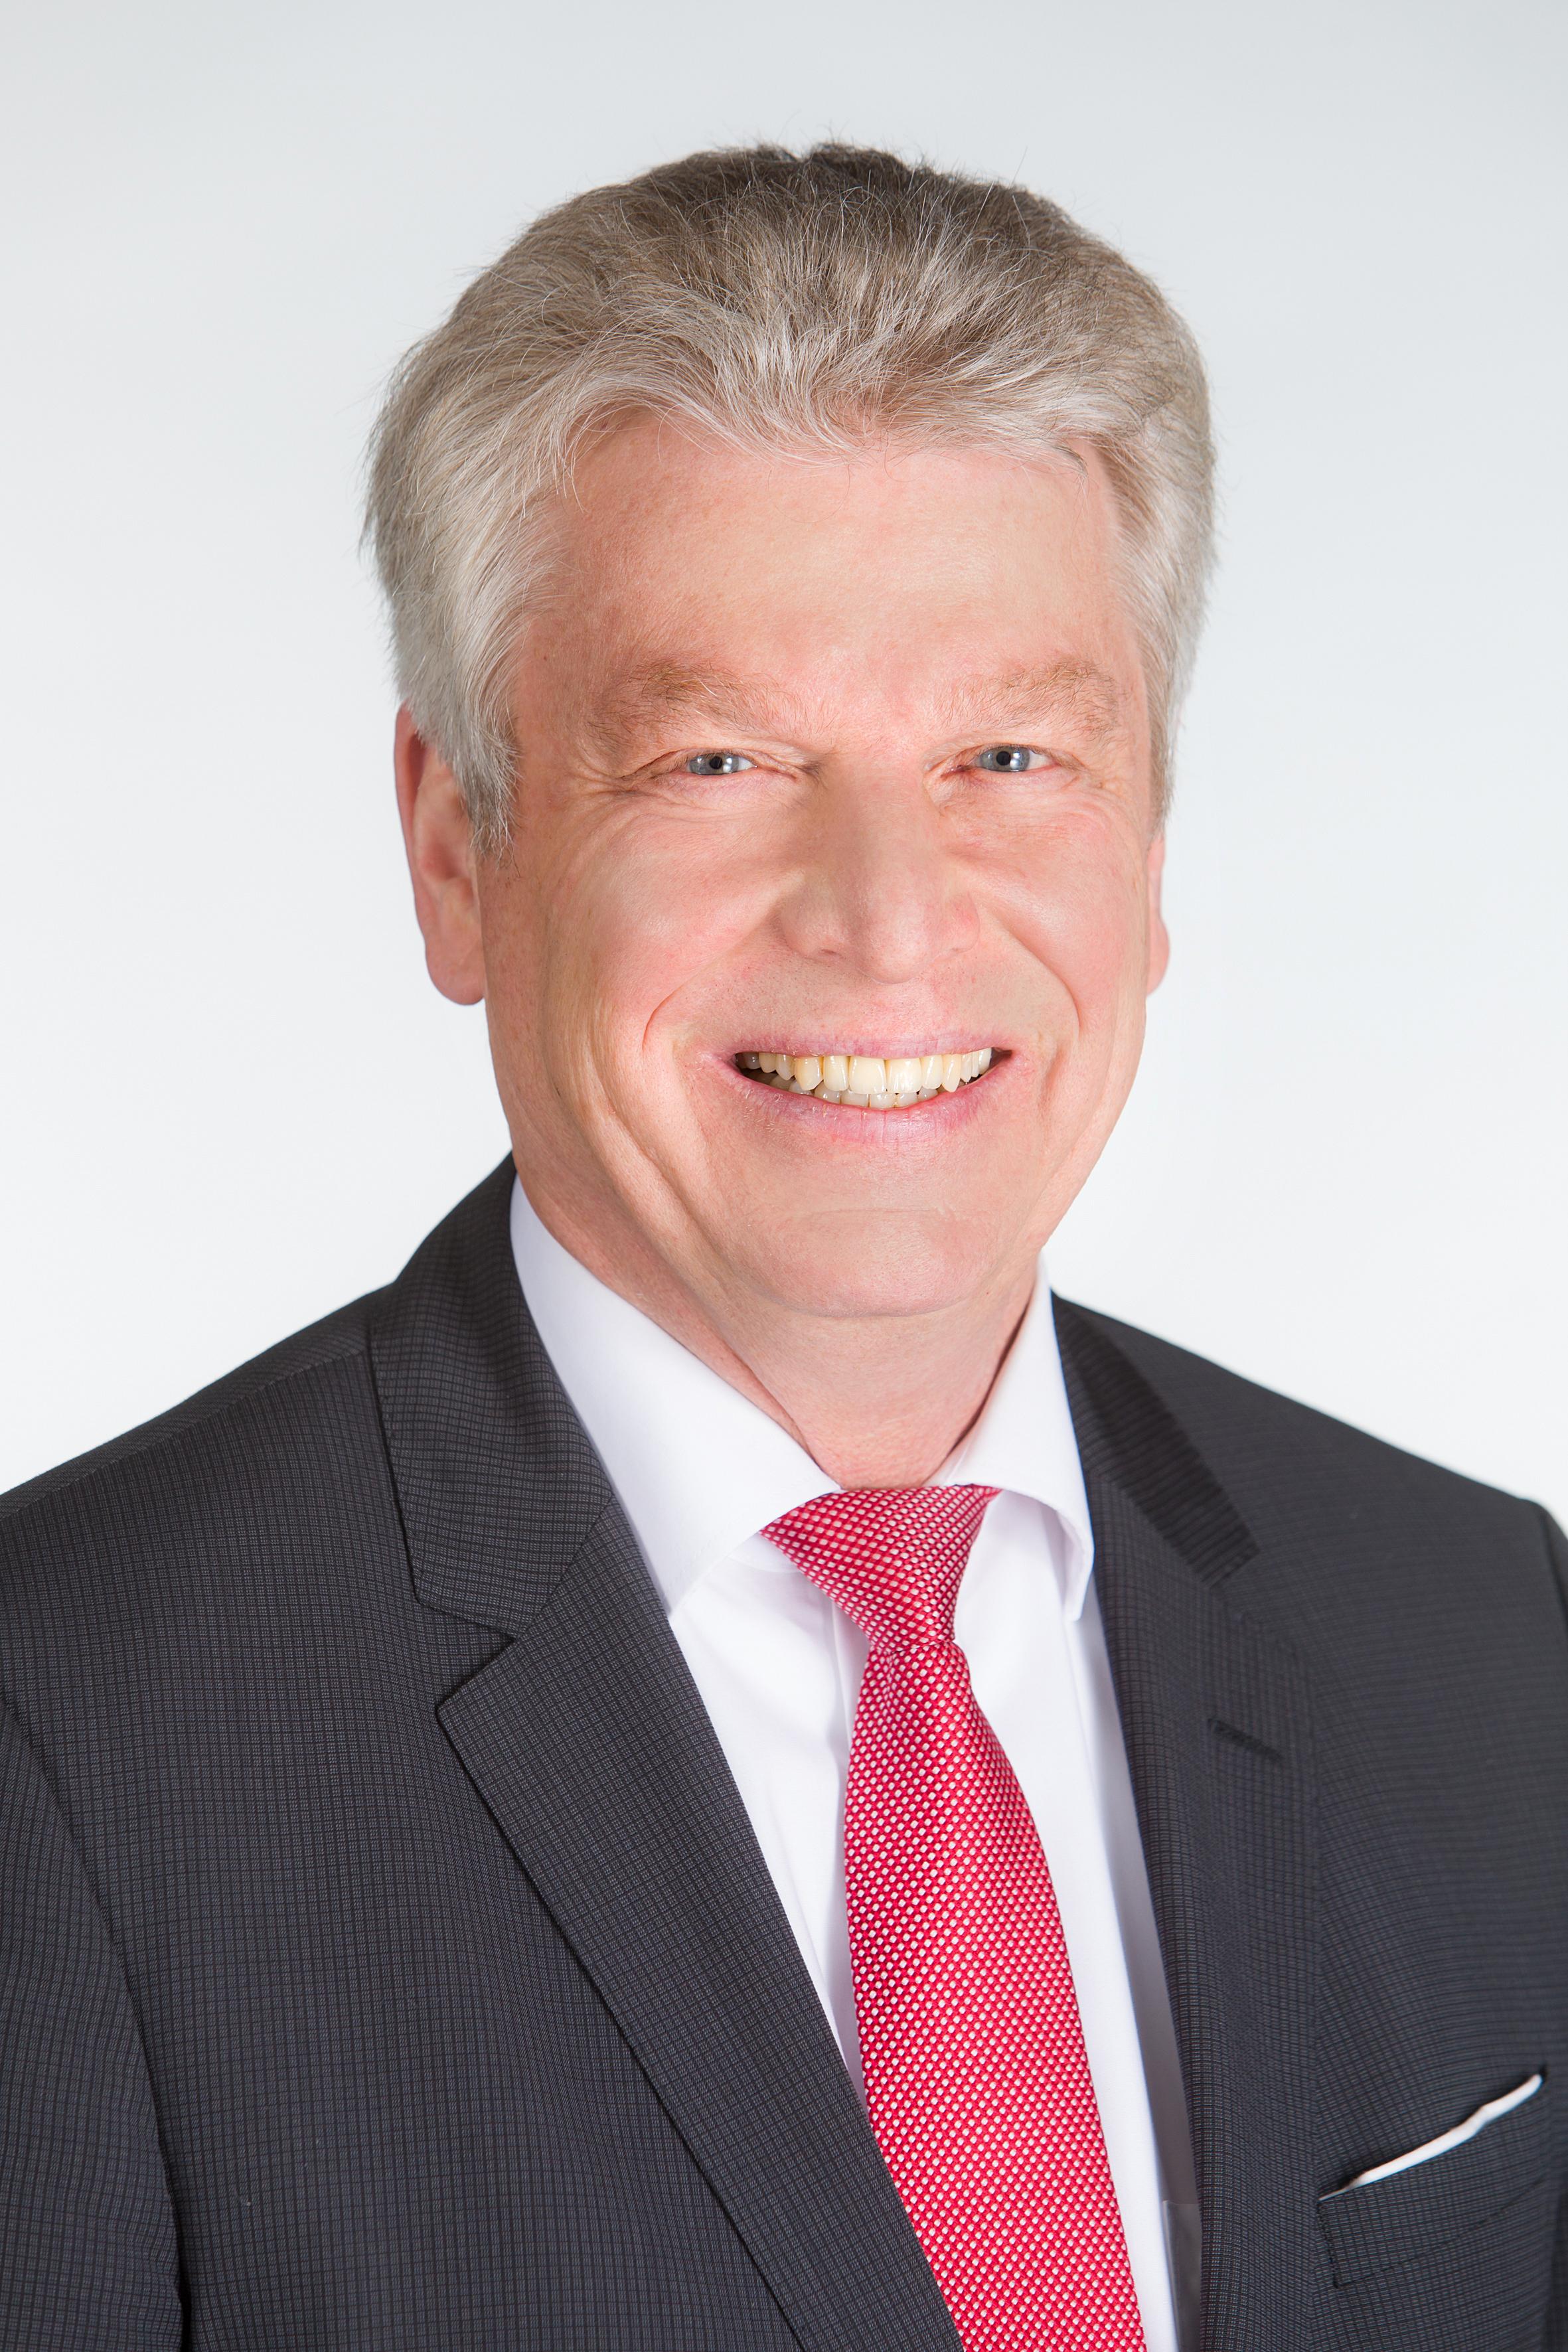 Oberbürgermeister Jürgen Kessing